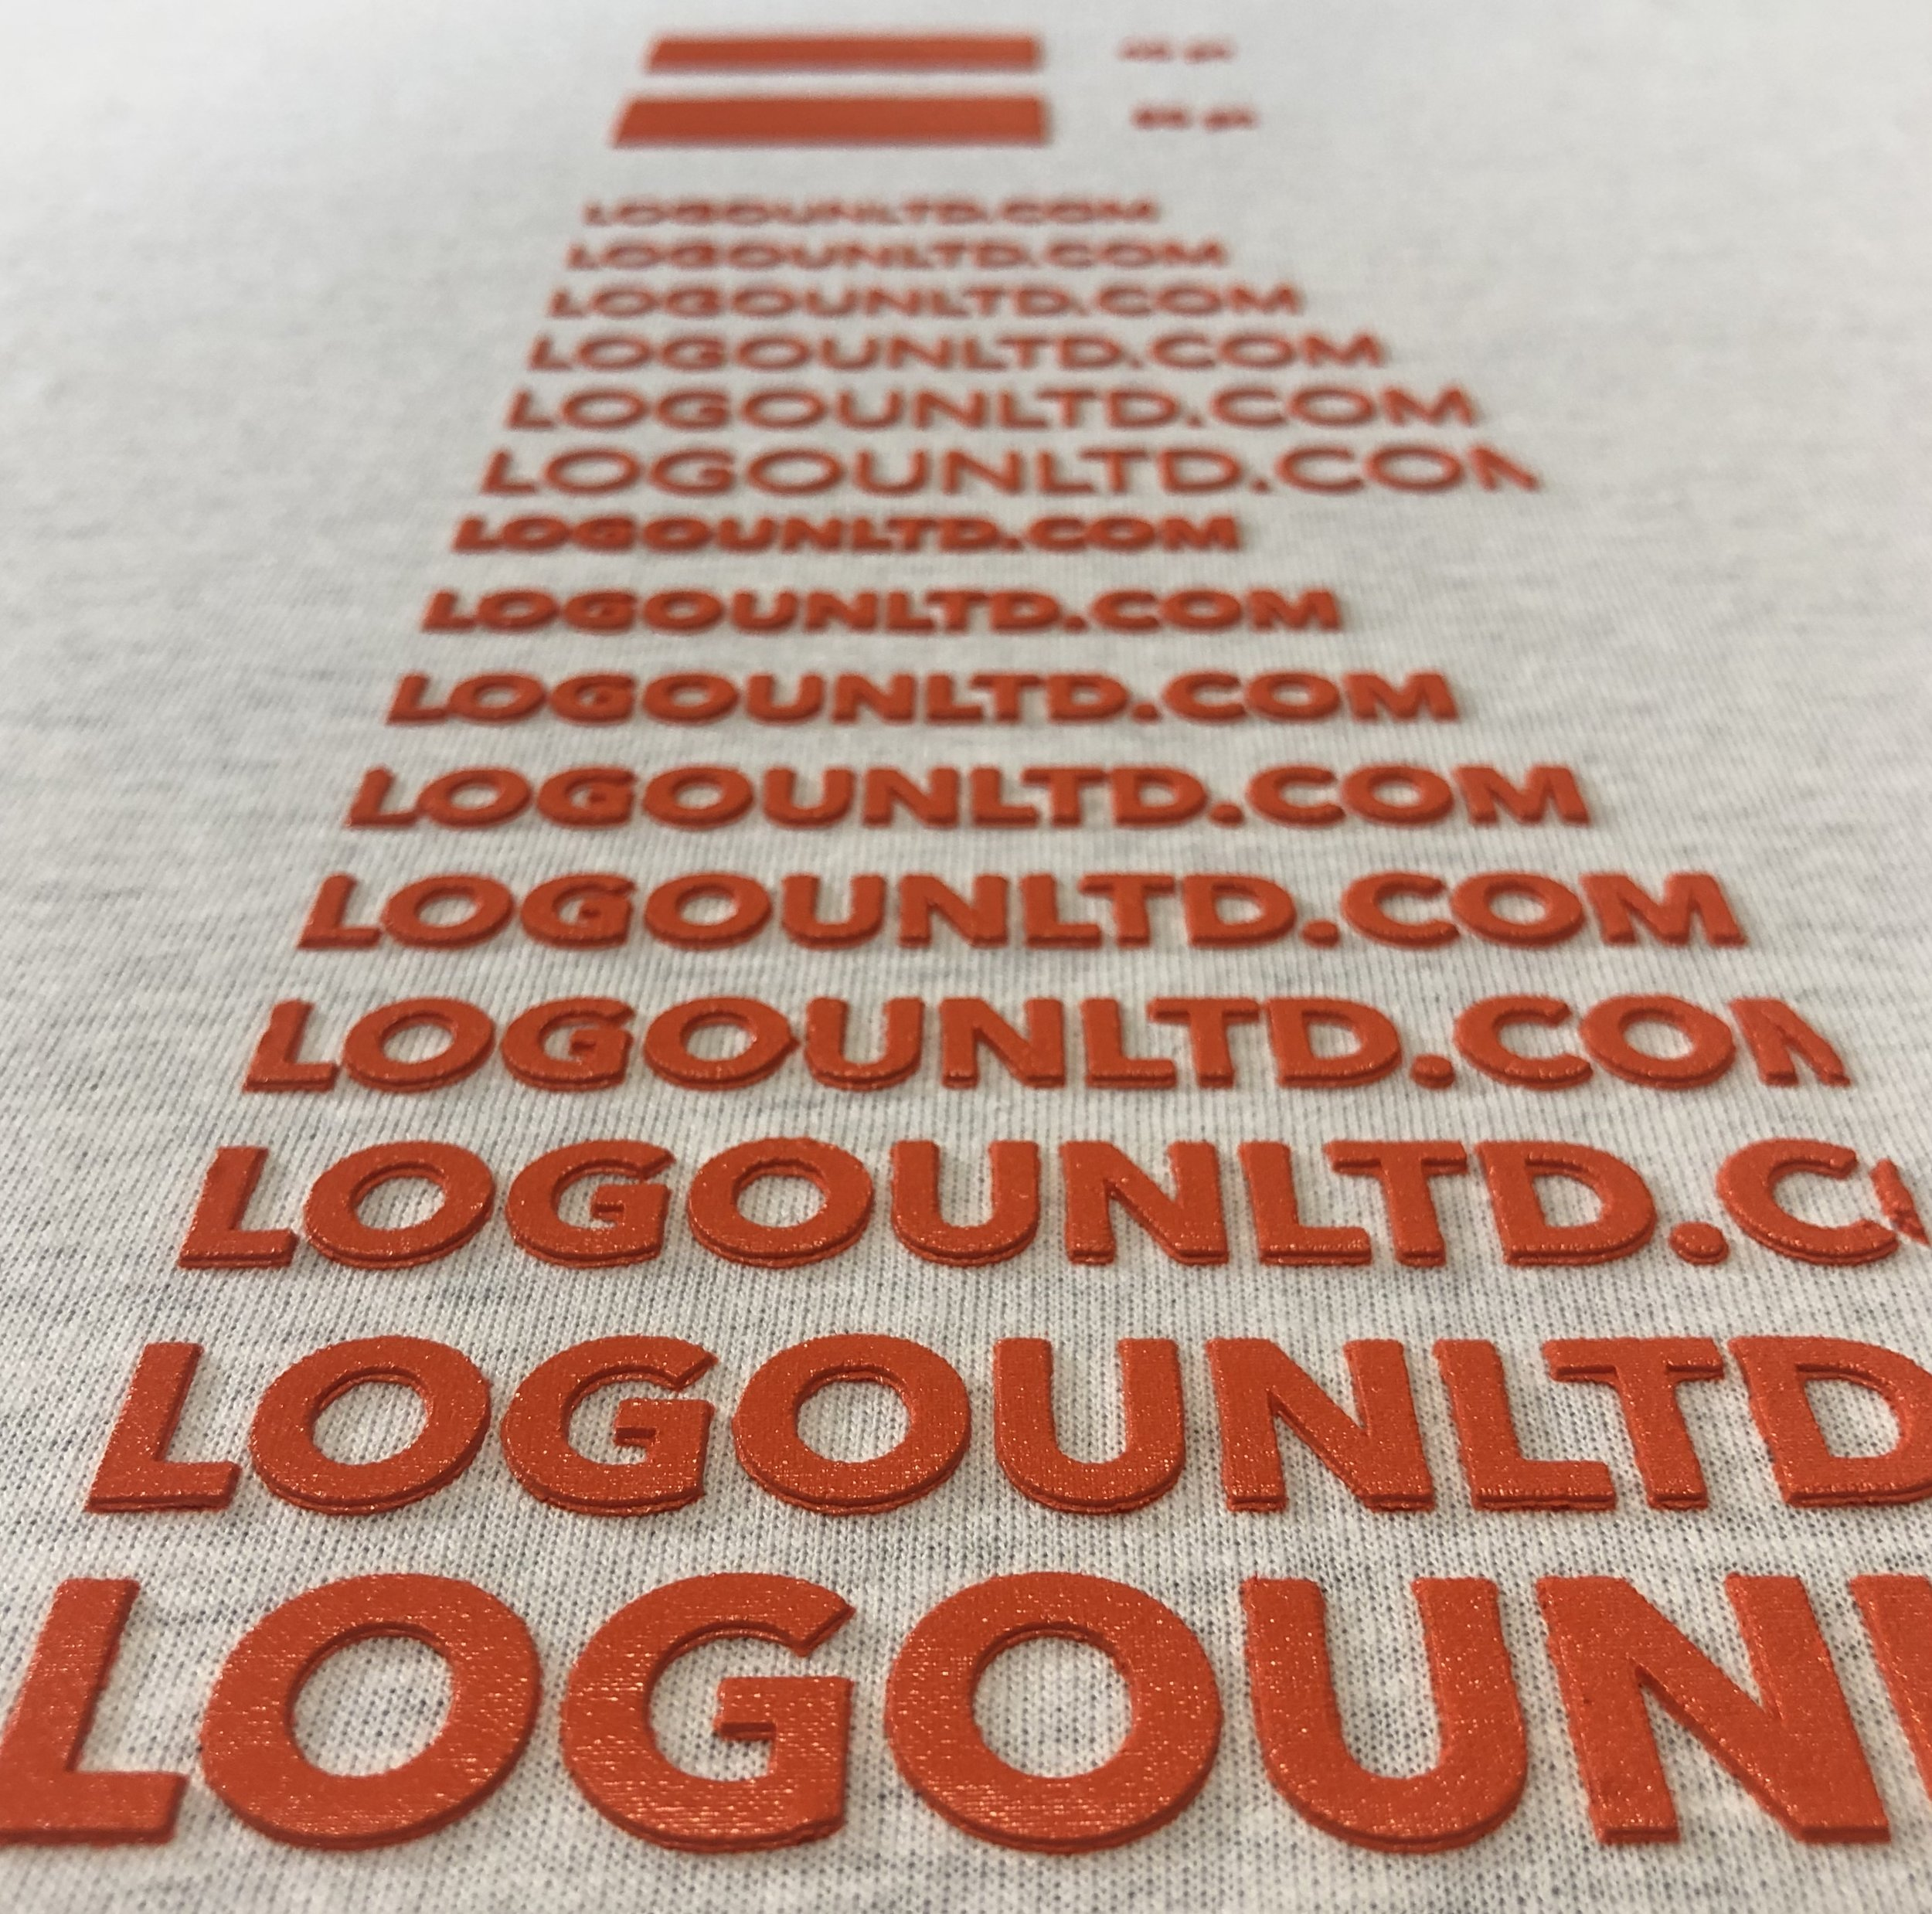 logounltd_laser_etching_embroidery_screen_printing_apparel_uniform_custom_tshirts_kirkland_bellevue_seattle_redmond_woodinville_branded_merchandise_promotional_products_logo_unltd_specialty_inks_HD_gel_raised (6).jpg